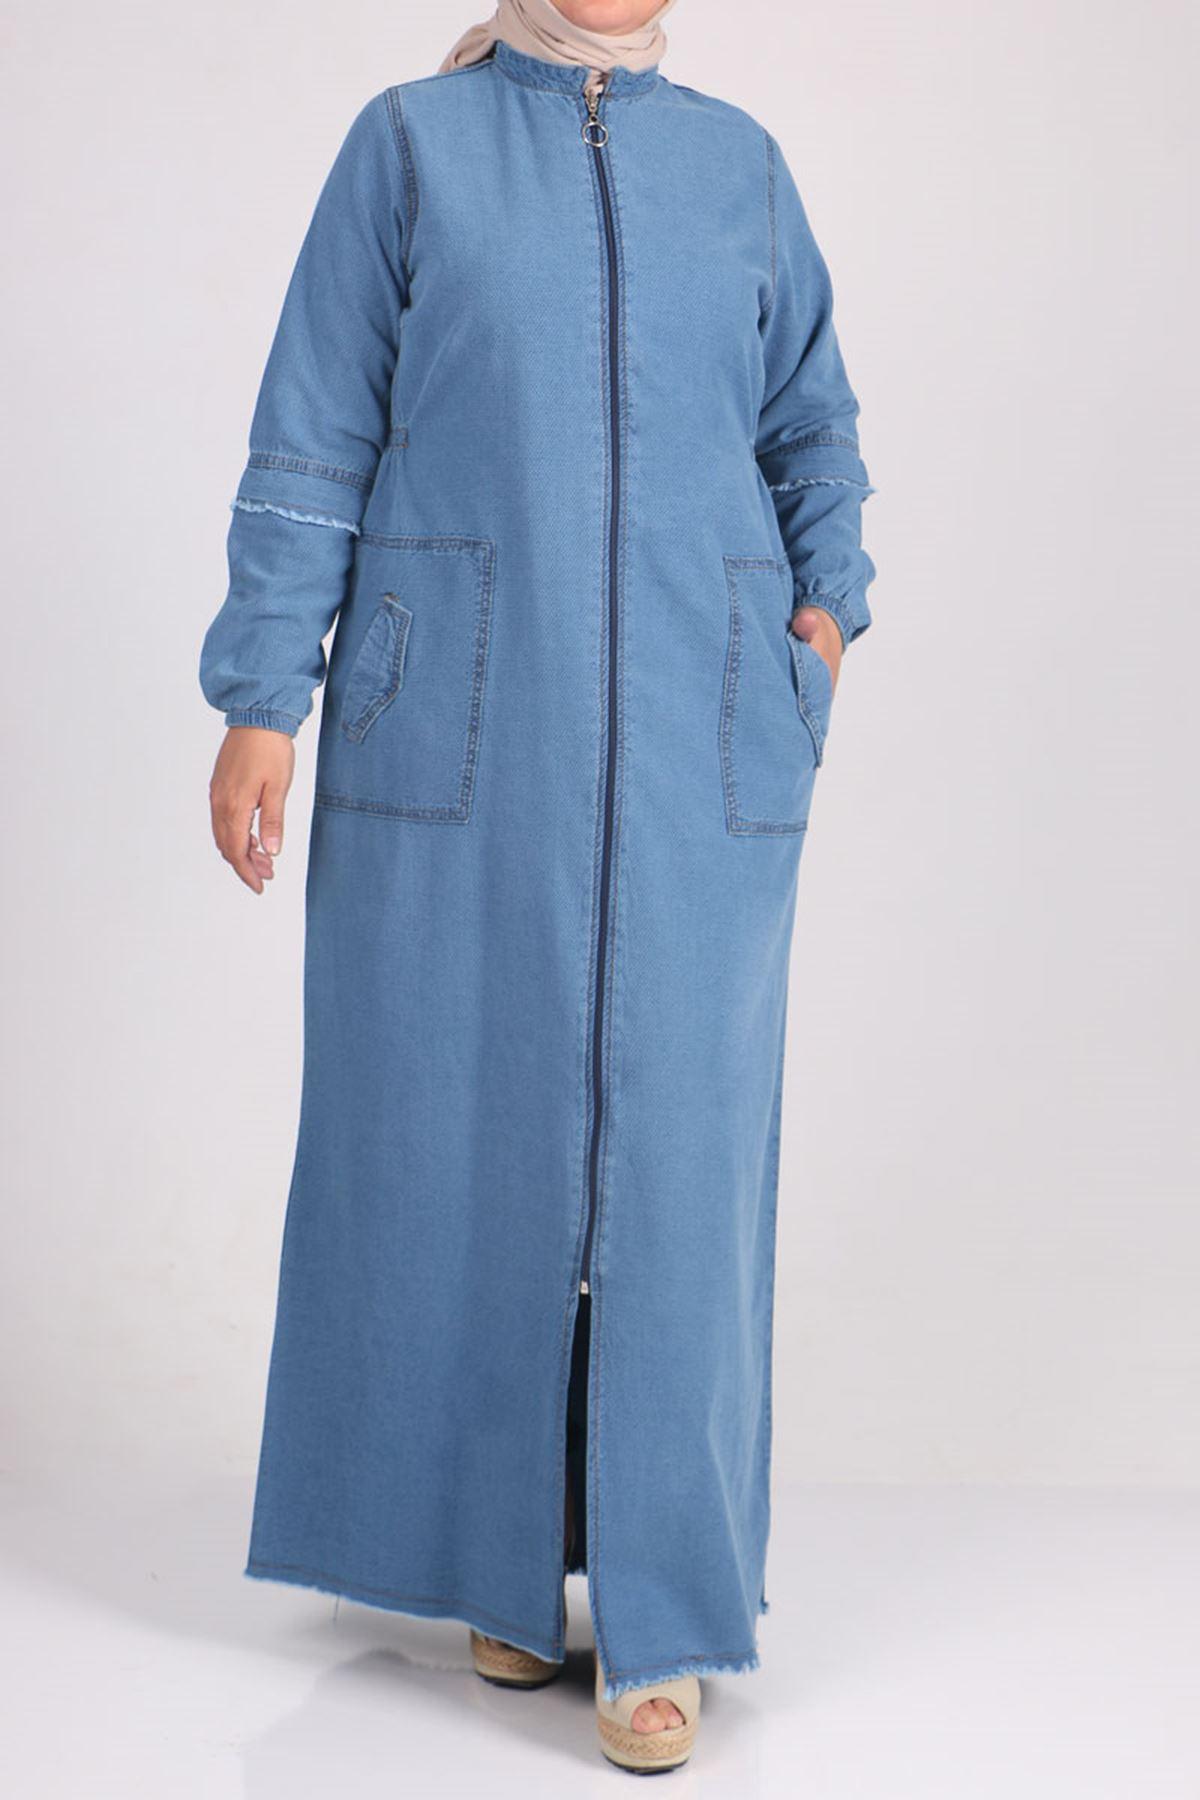 6043 Plus Size Zip-down Jeans Abaya - Blue